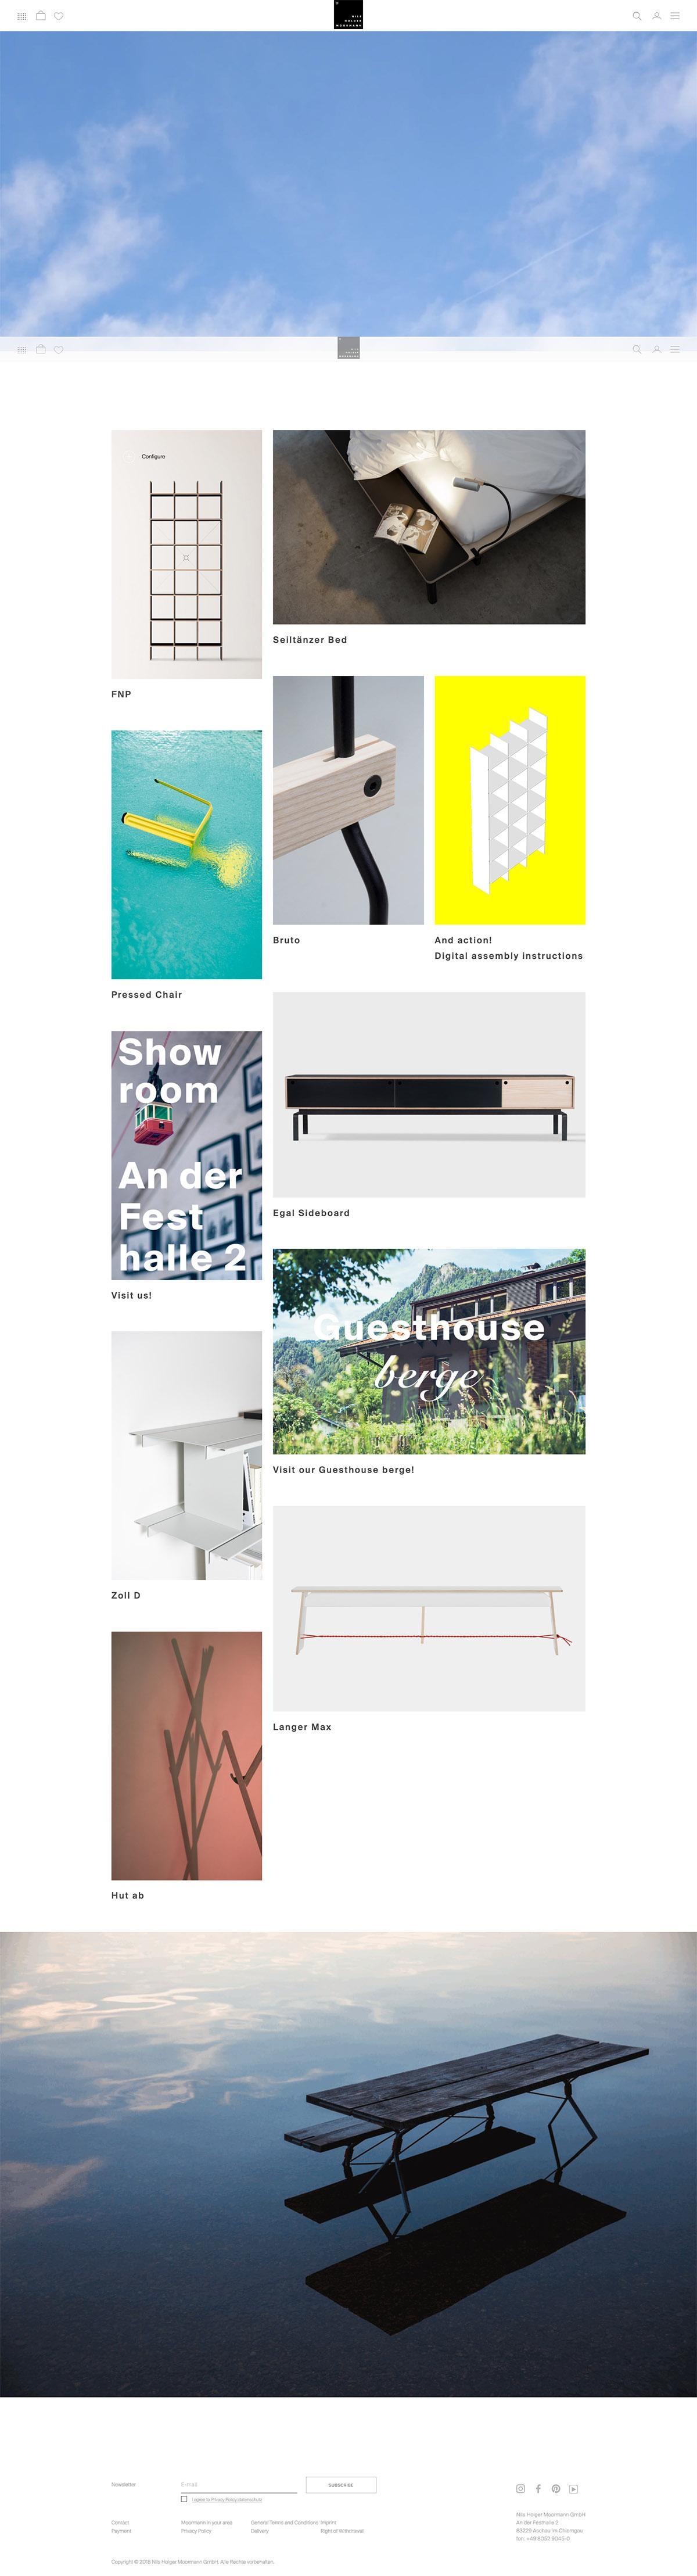 eCommerce website: Nils Holger MOORMANN